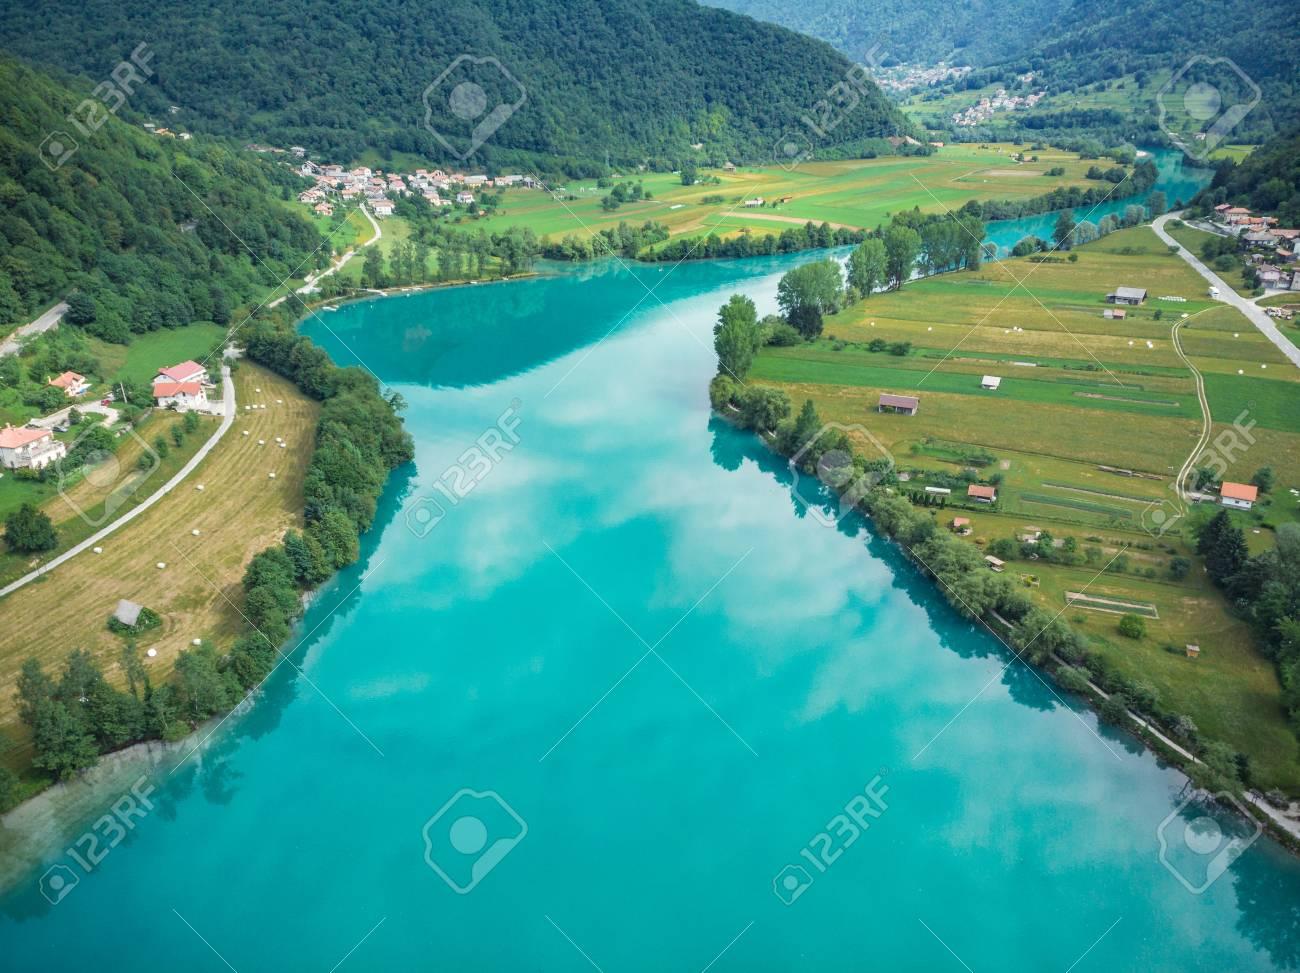 Beautiful unreal emerald green water in Most na Soci, Slovenia